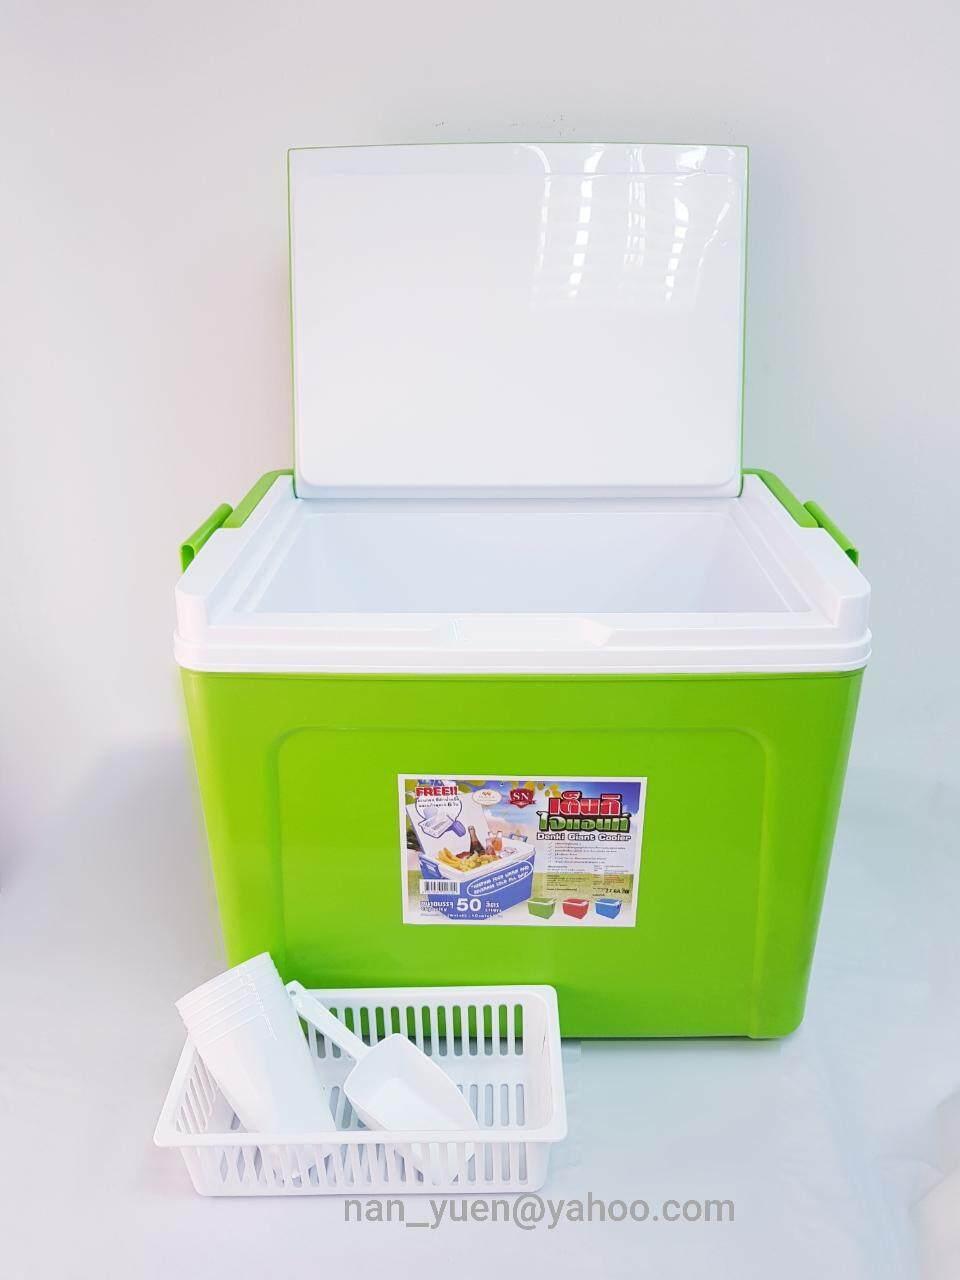 Gea Mini Showcase Display Cooler 50 Lt Expo Putih Khusus Modena Sc 1281 280 Liter Hitam Jabodetabek 35 Litre Dragonware Denki Ice Box Green 2